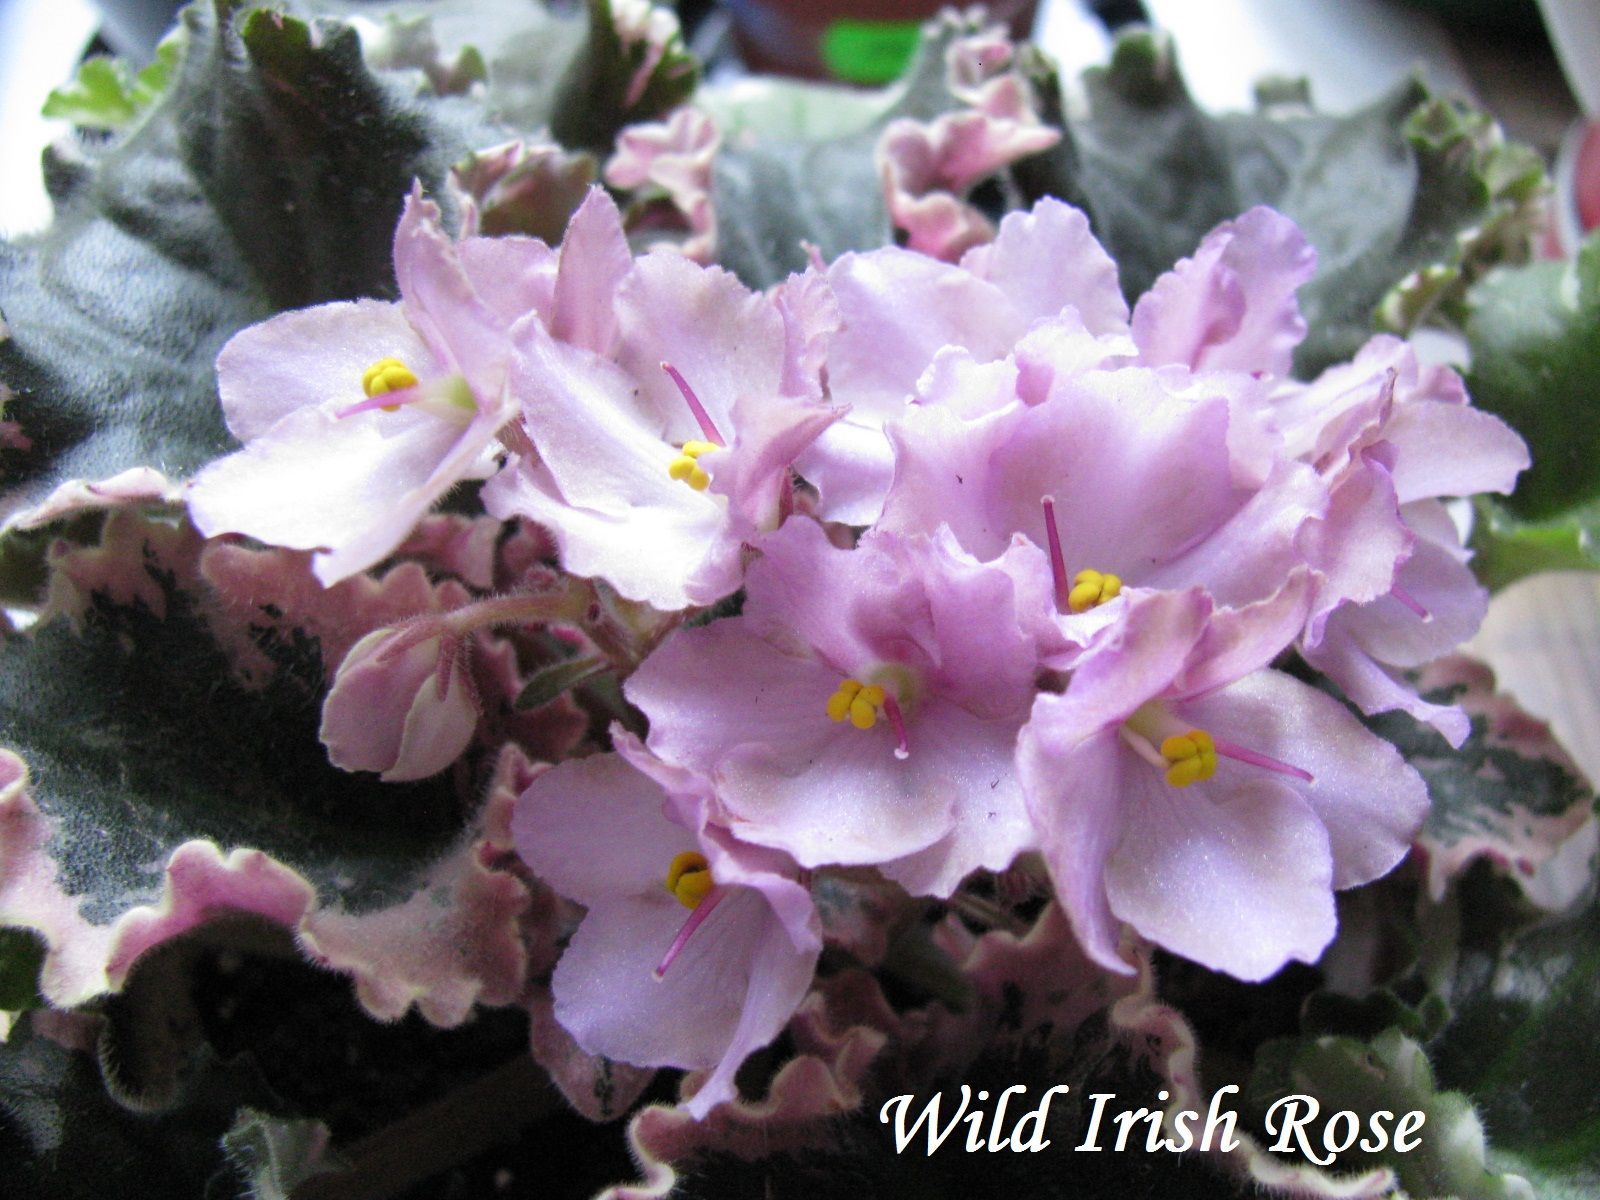 ирландская роза фото фиалки освещение